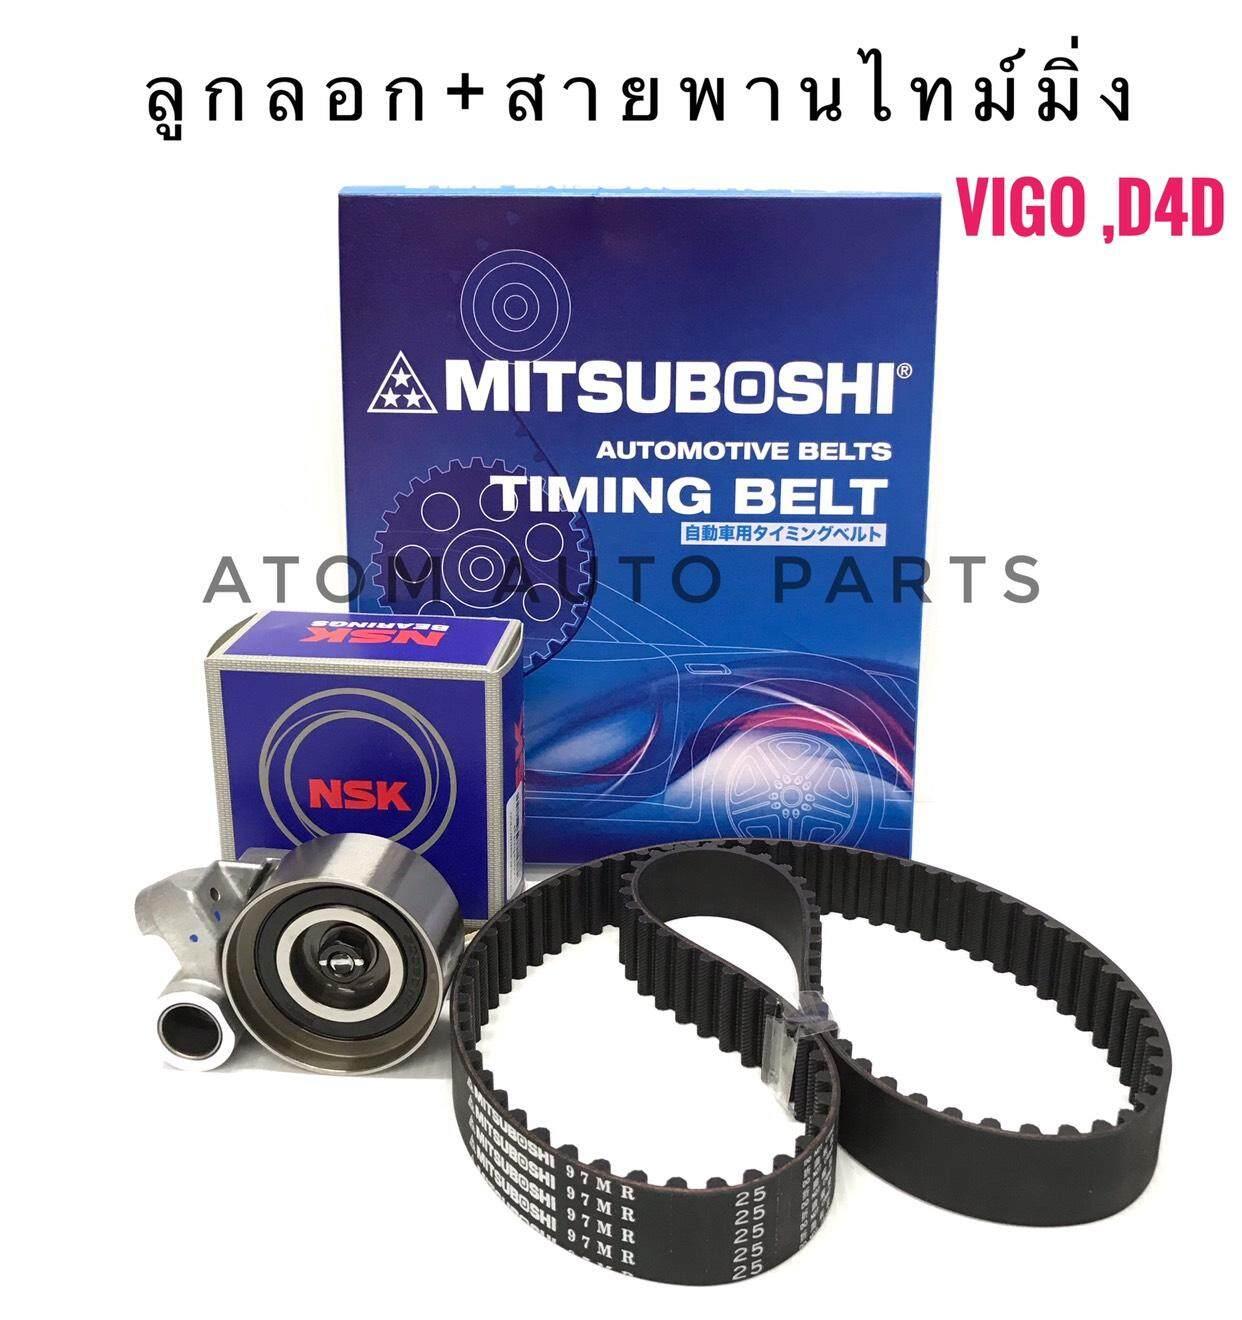 Mitsuboshi สายพานไทม์มิ่ง สายพานราวลิ้น +ลูกลอก สำหรับ Vigo,commuter,tiger D4d(1kd,2kd) By Atom Auto Parts.